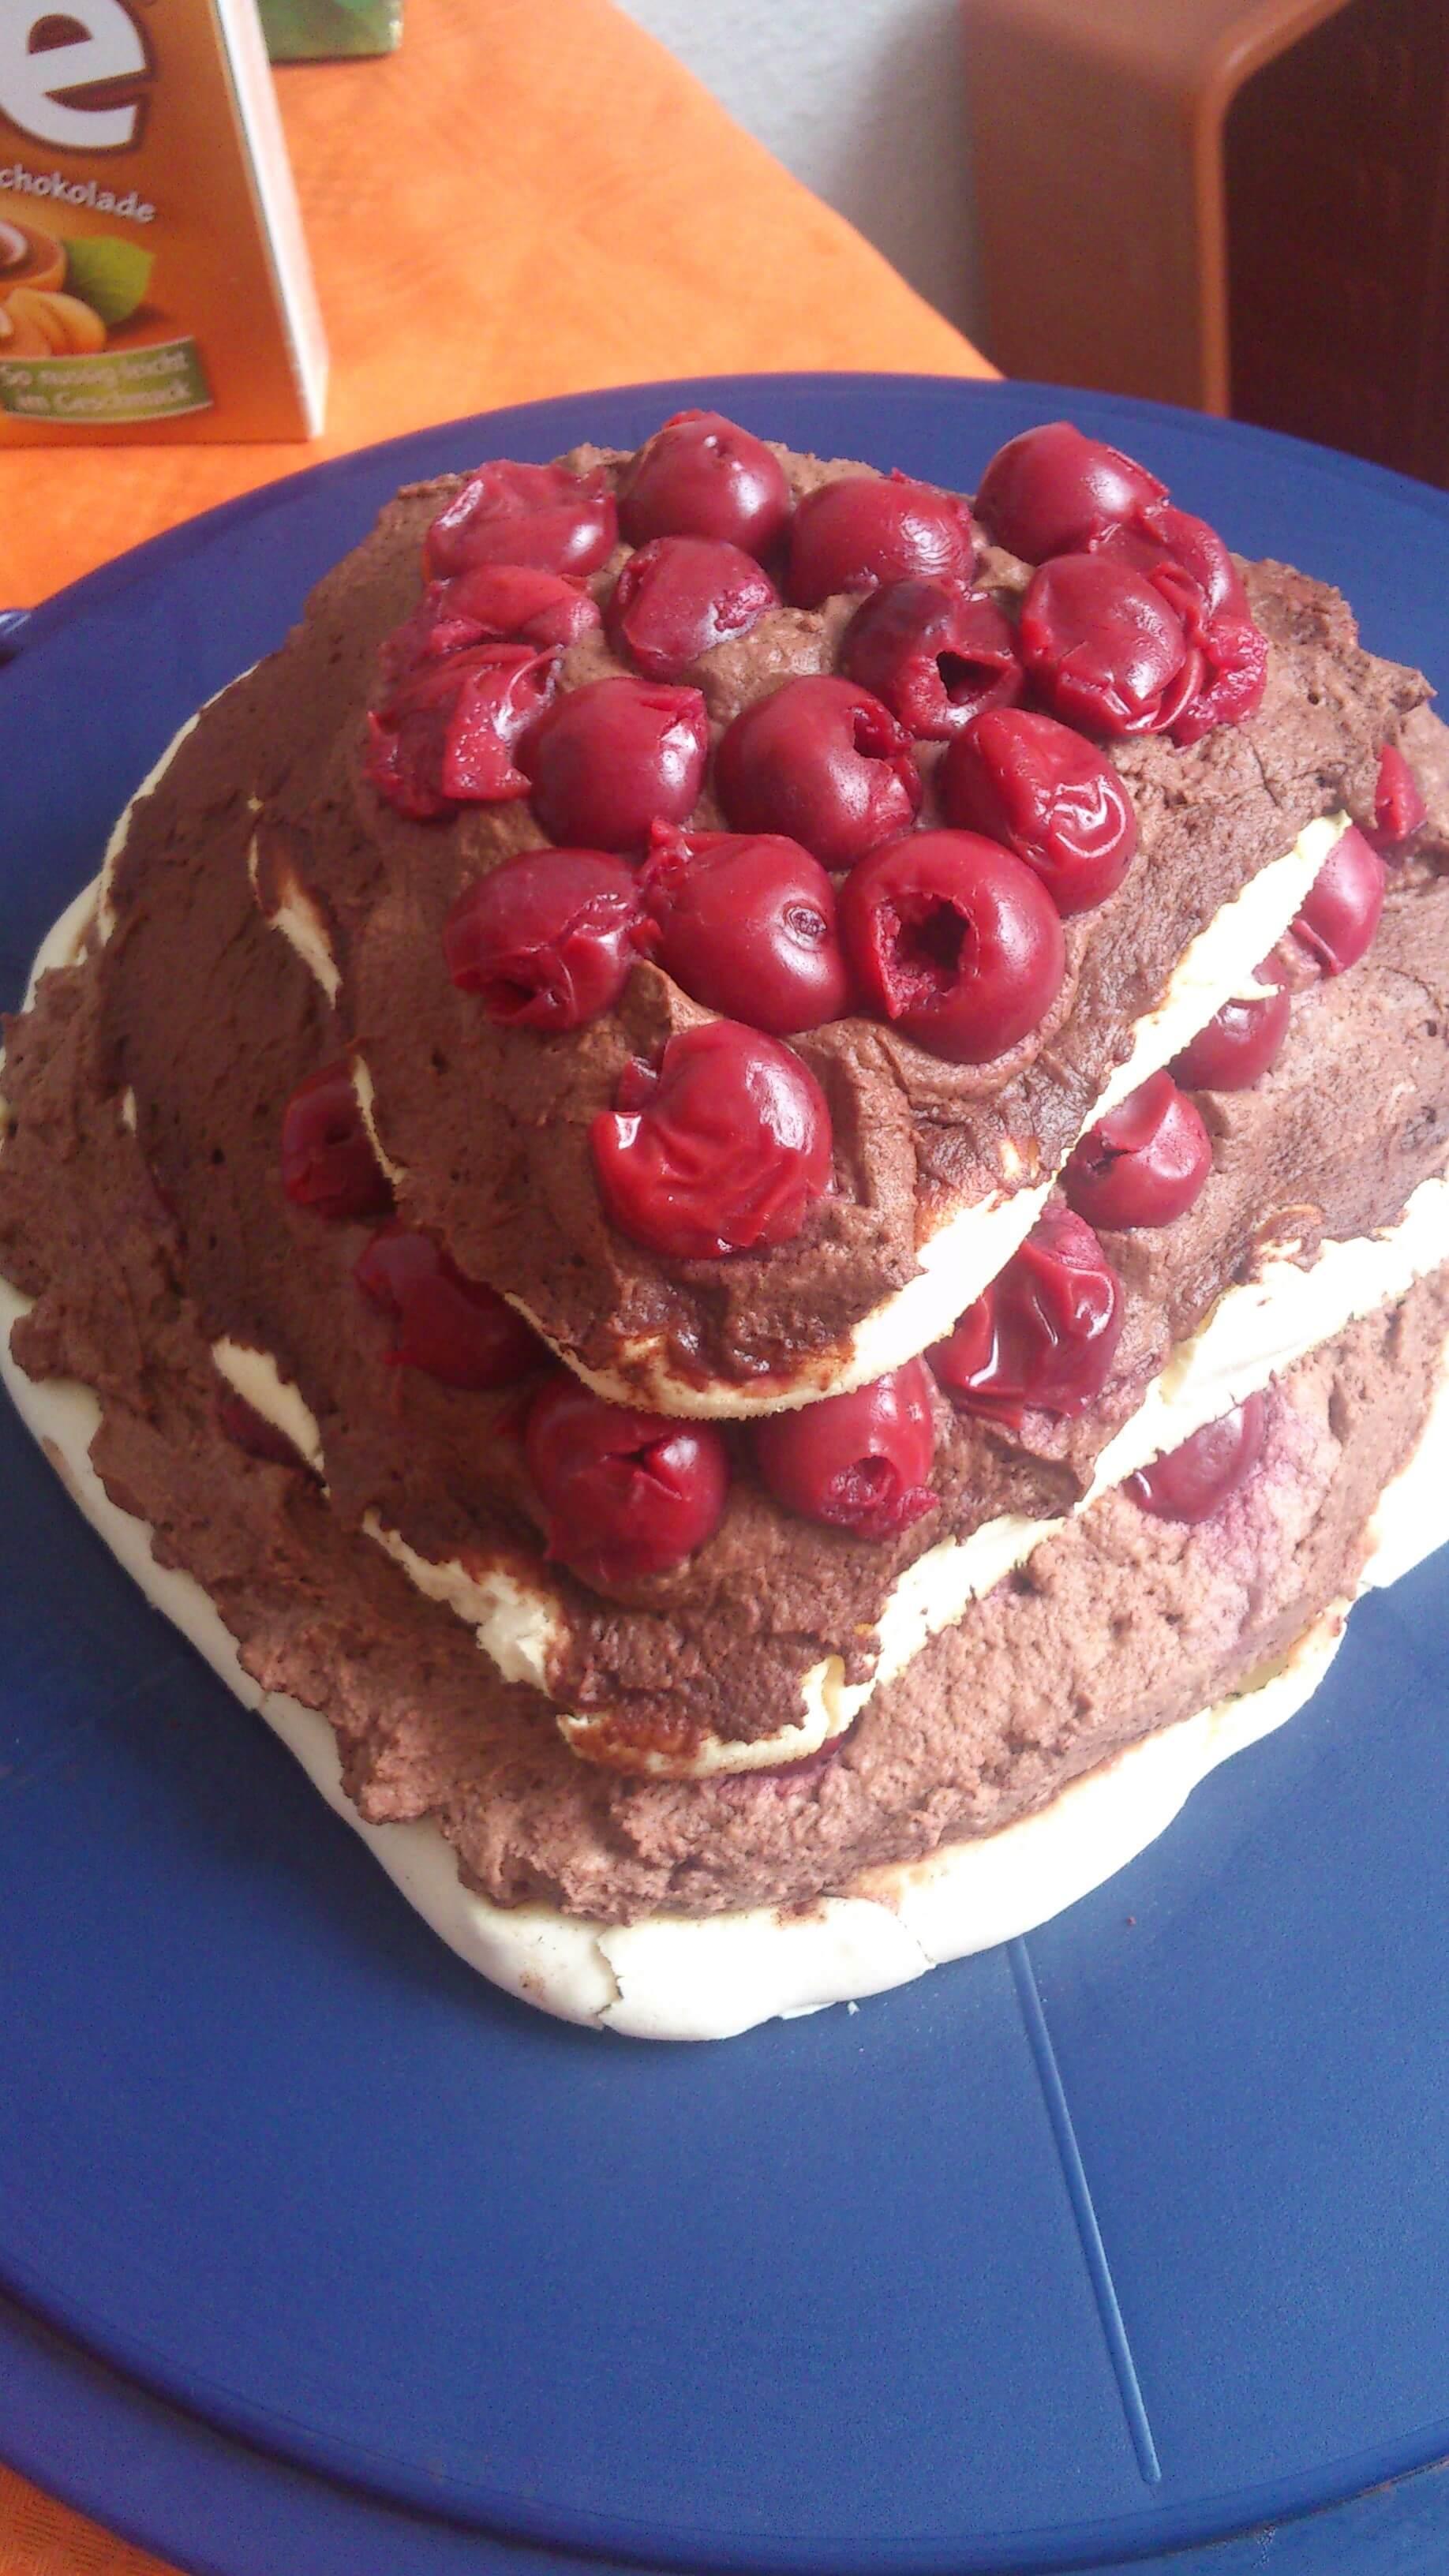 Süßes Torte (c) familienfreund.de